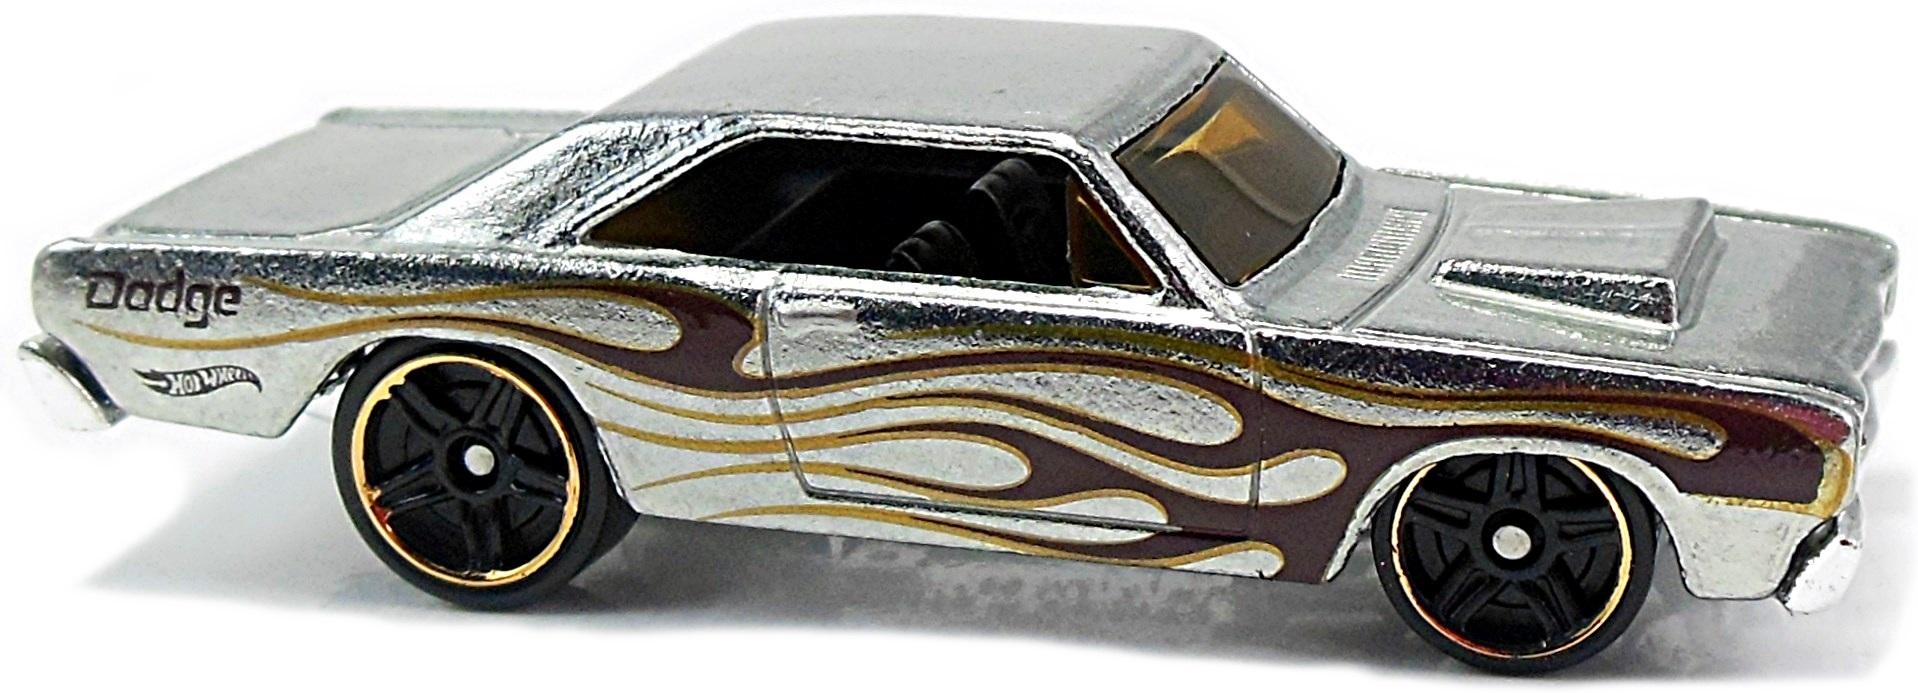 /'68 DODGE DART Hot Wheels HW FLAMES ZAMAC 2017